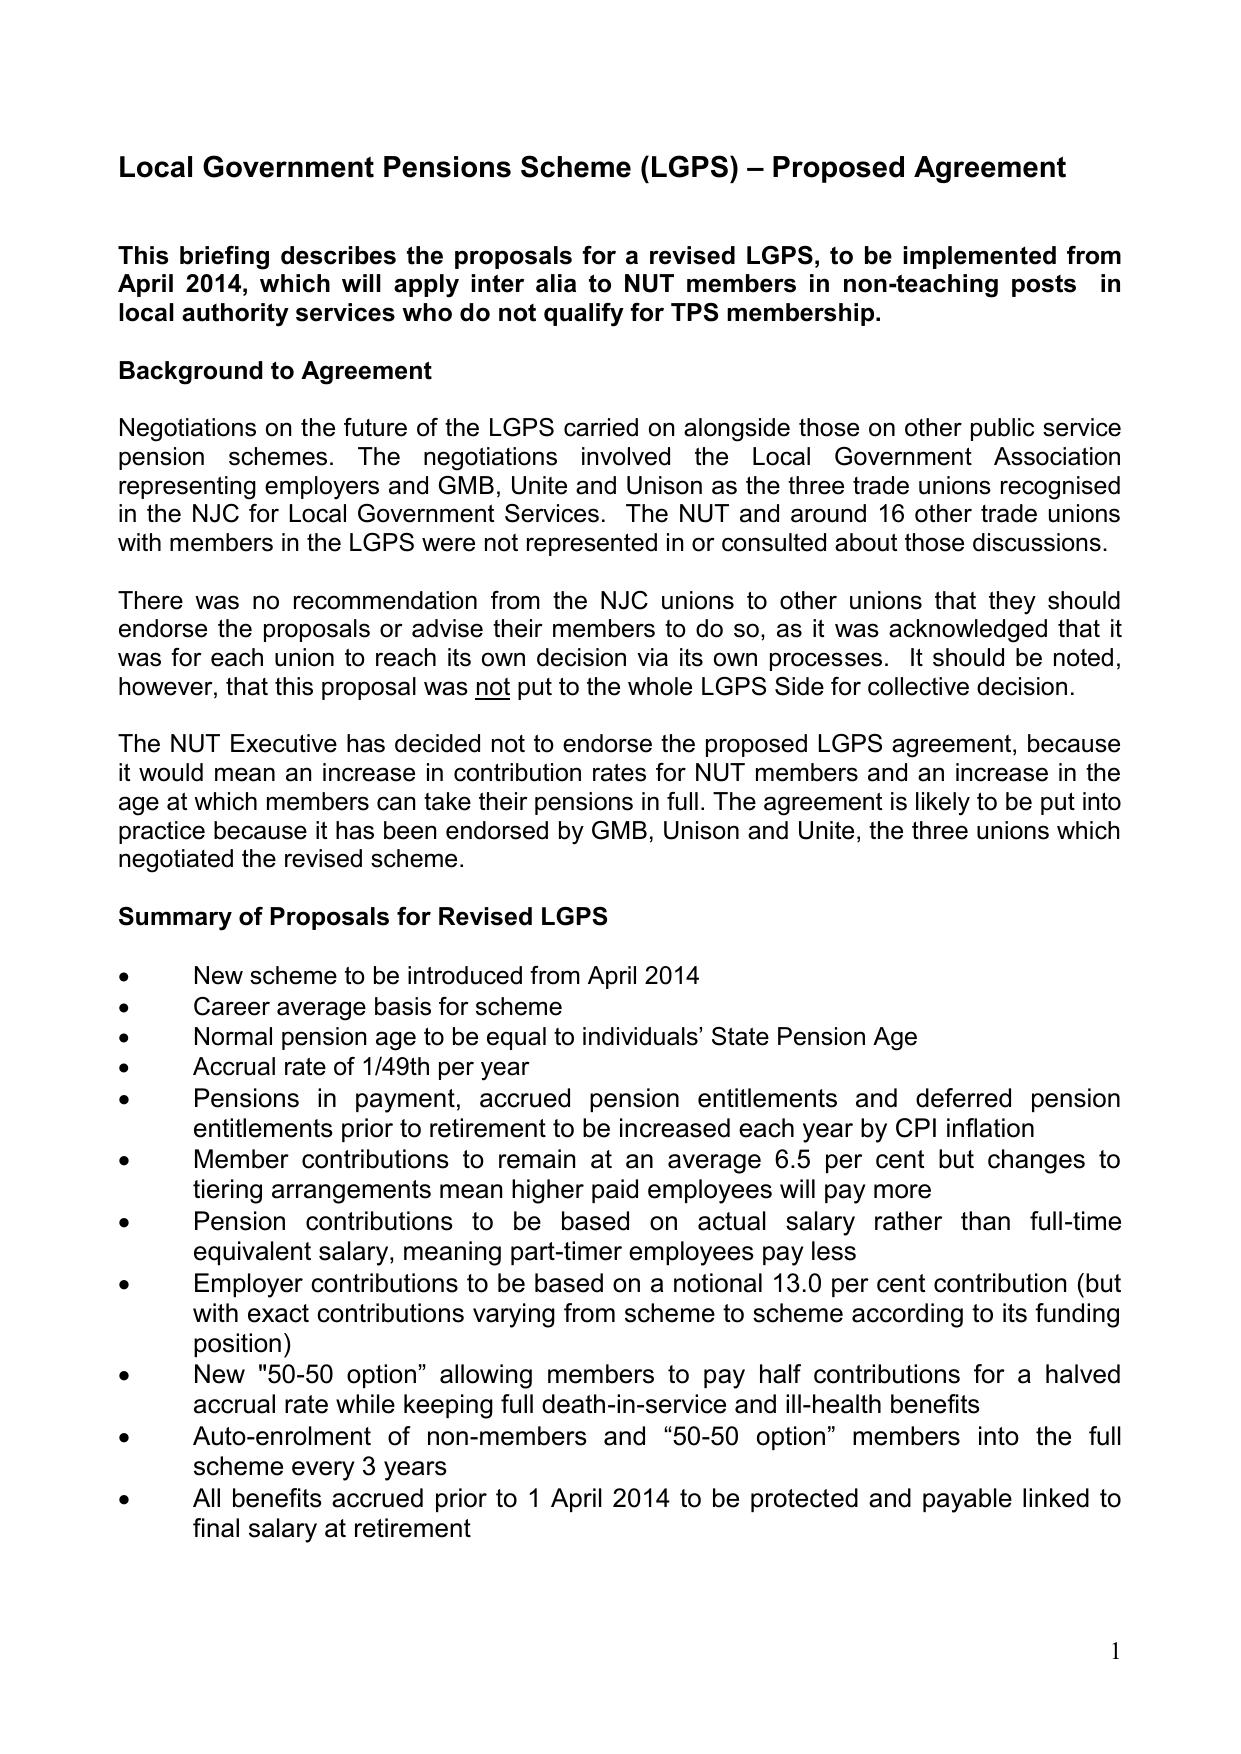 Local Government Pensions Scheme Lgps Proposed